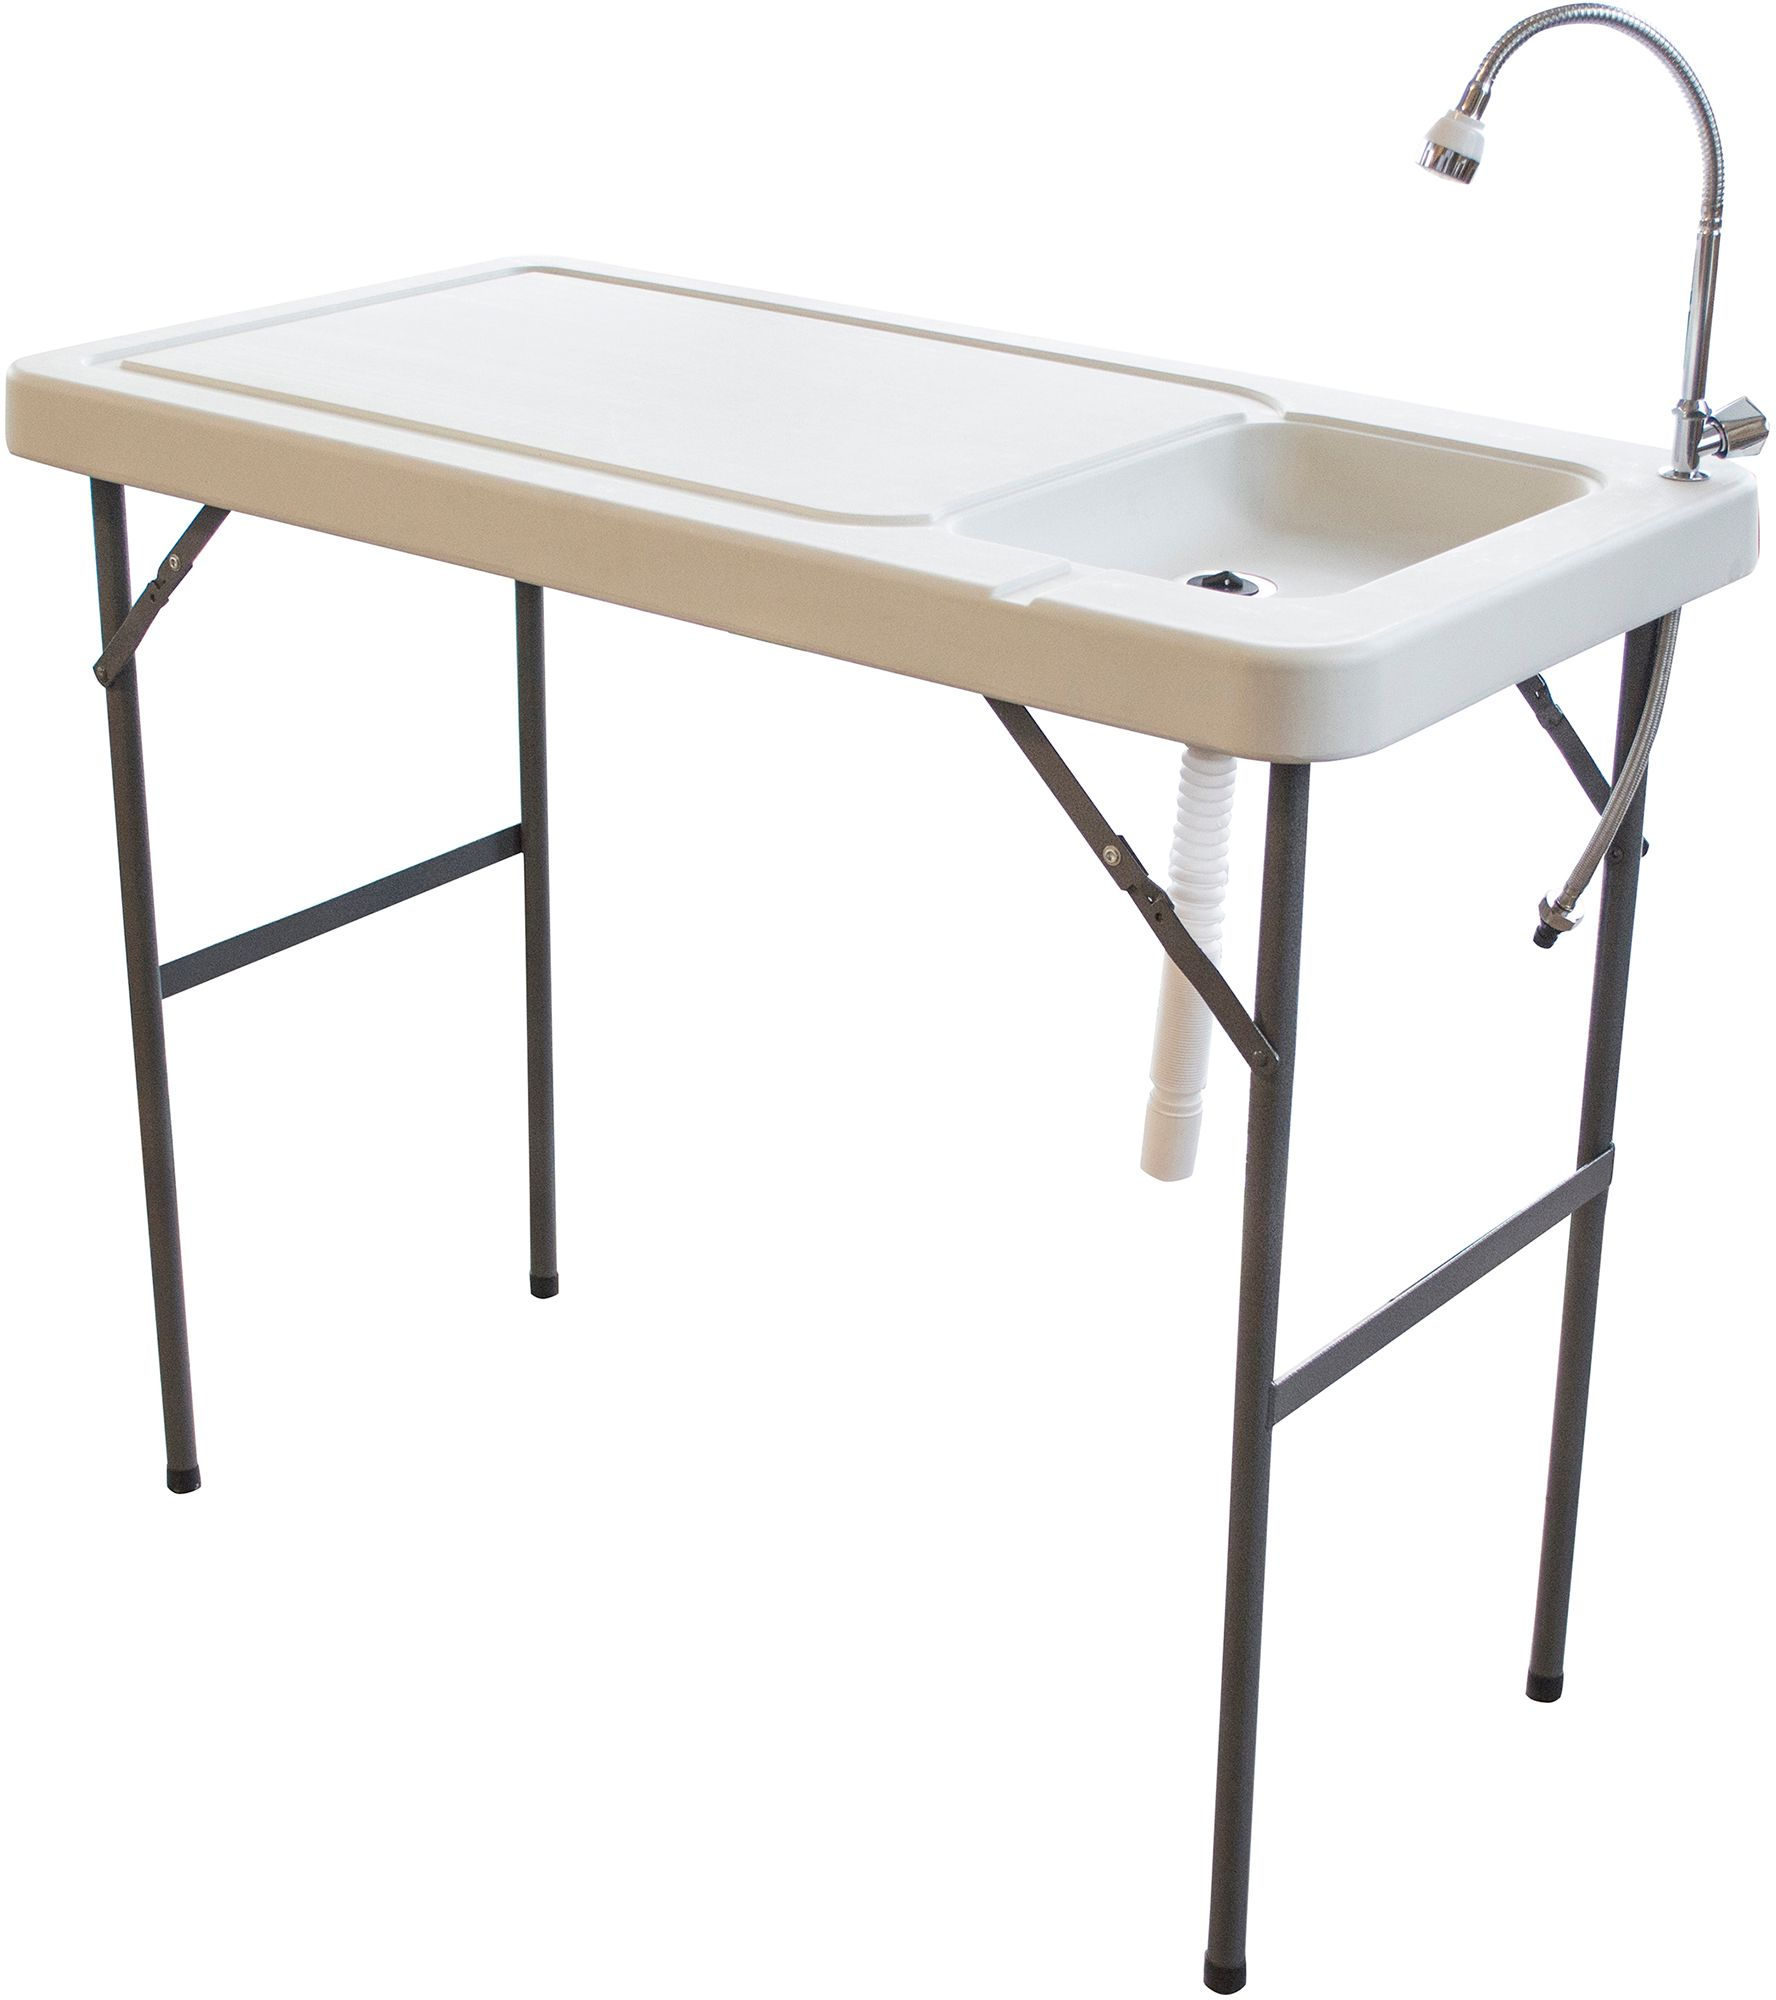 Sportsman Elite Portable Fish Table with Faucet